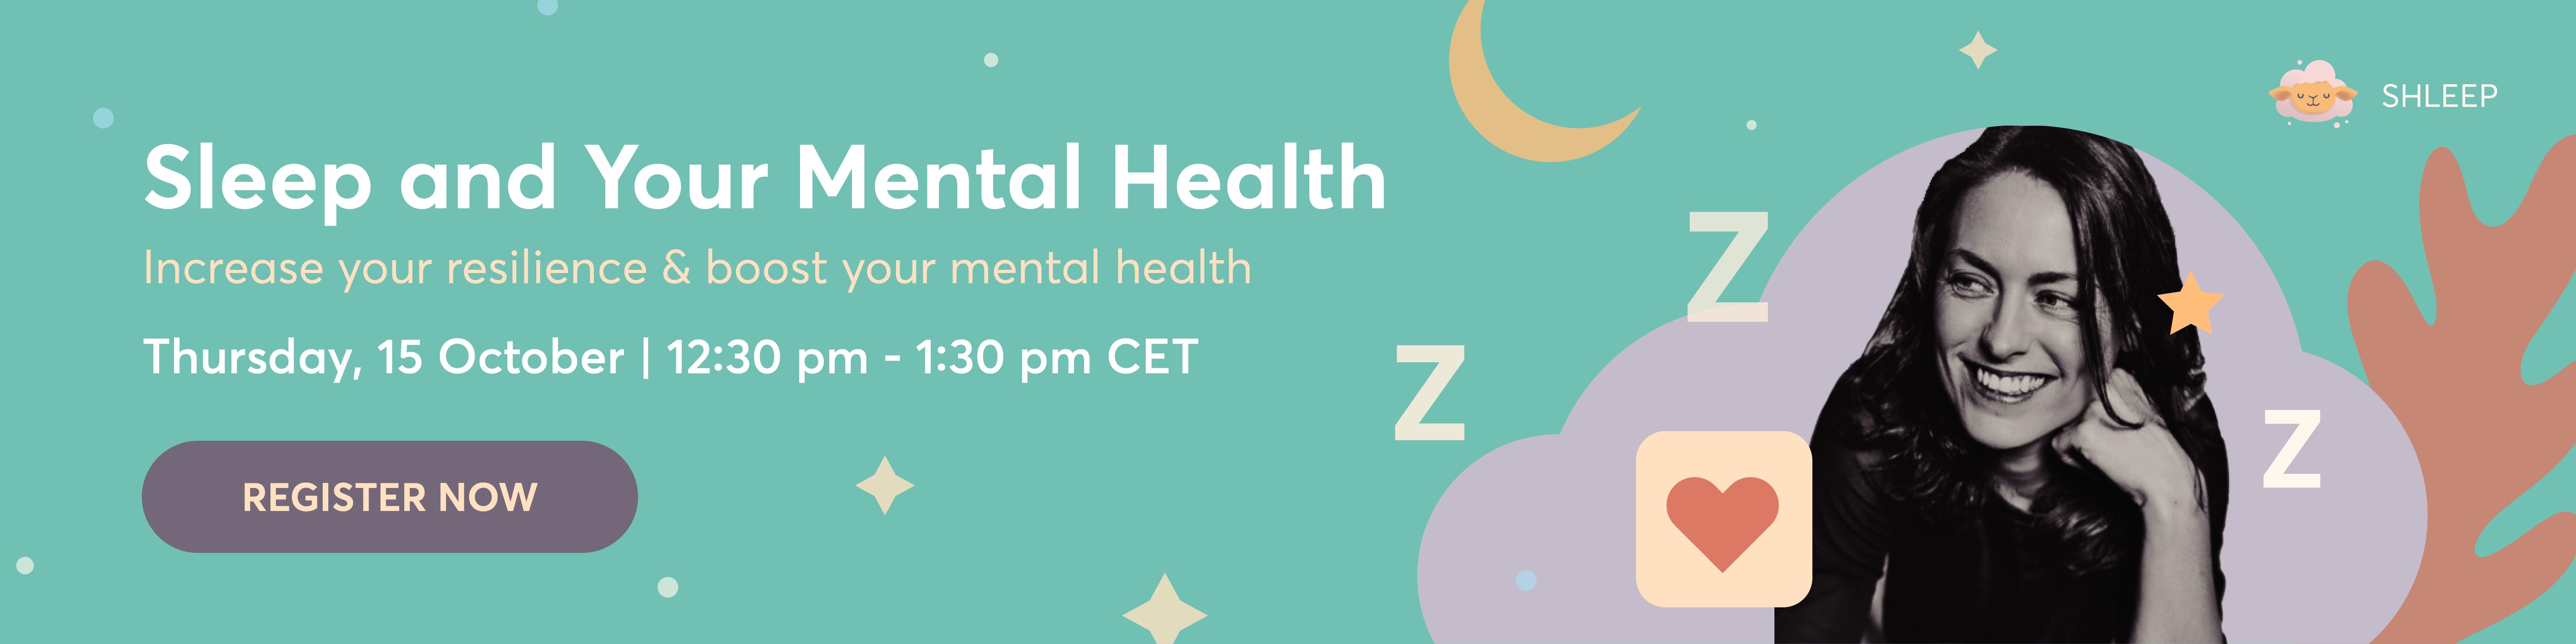 Sleep and your mental health webinar